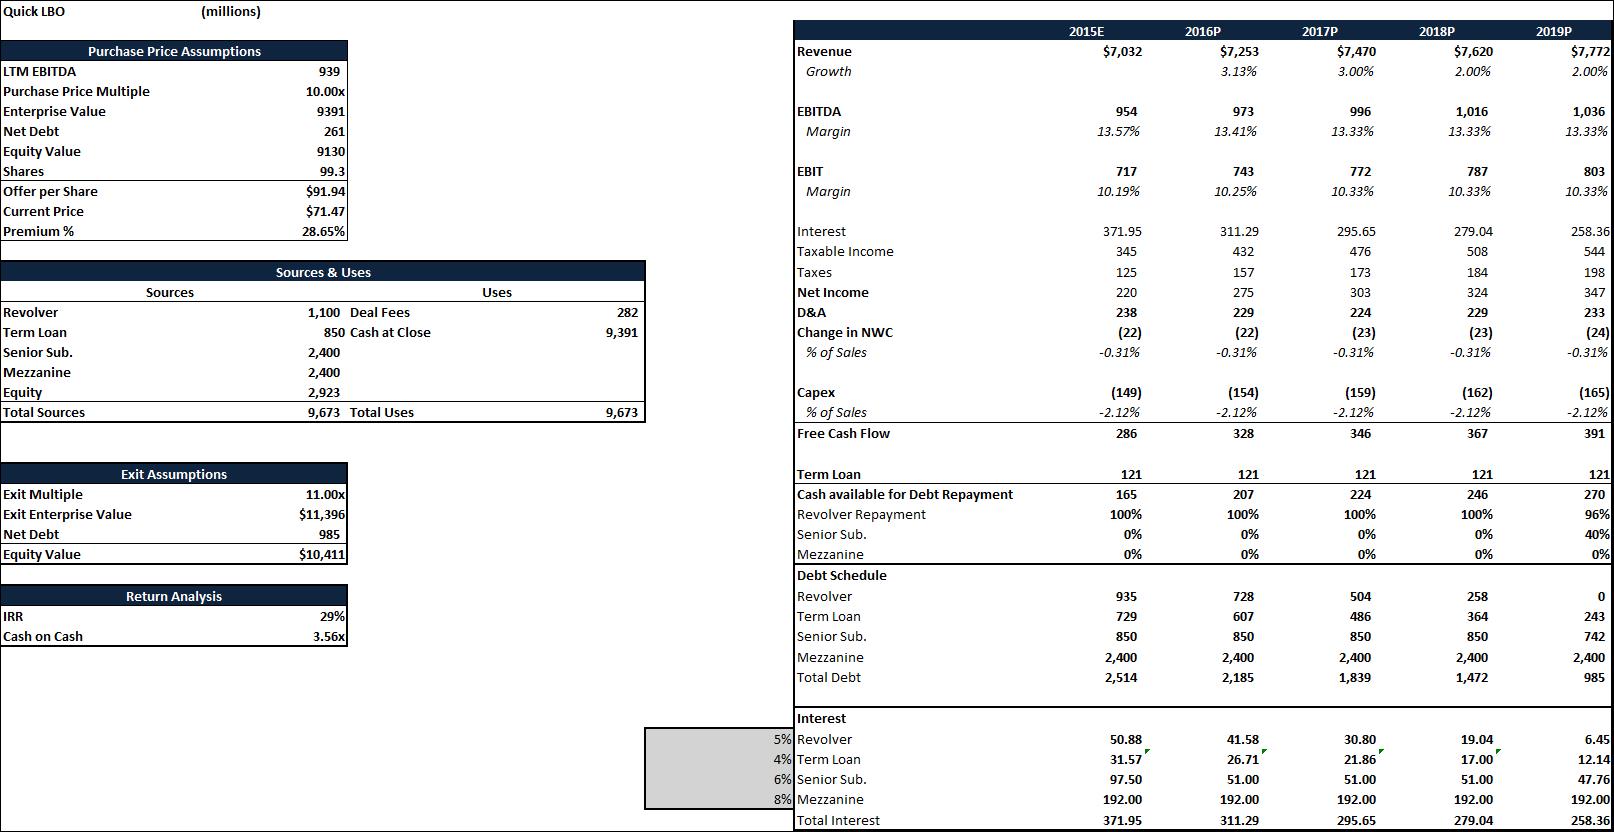 PetSmart LBO And Valuation Analysis: Minimum Upside Of 30